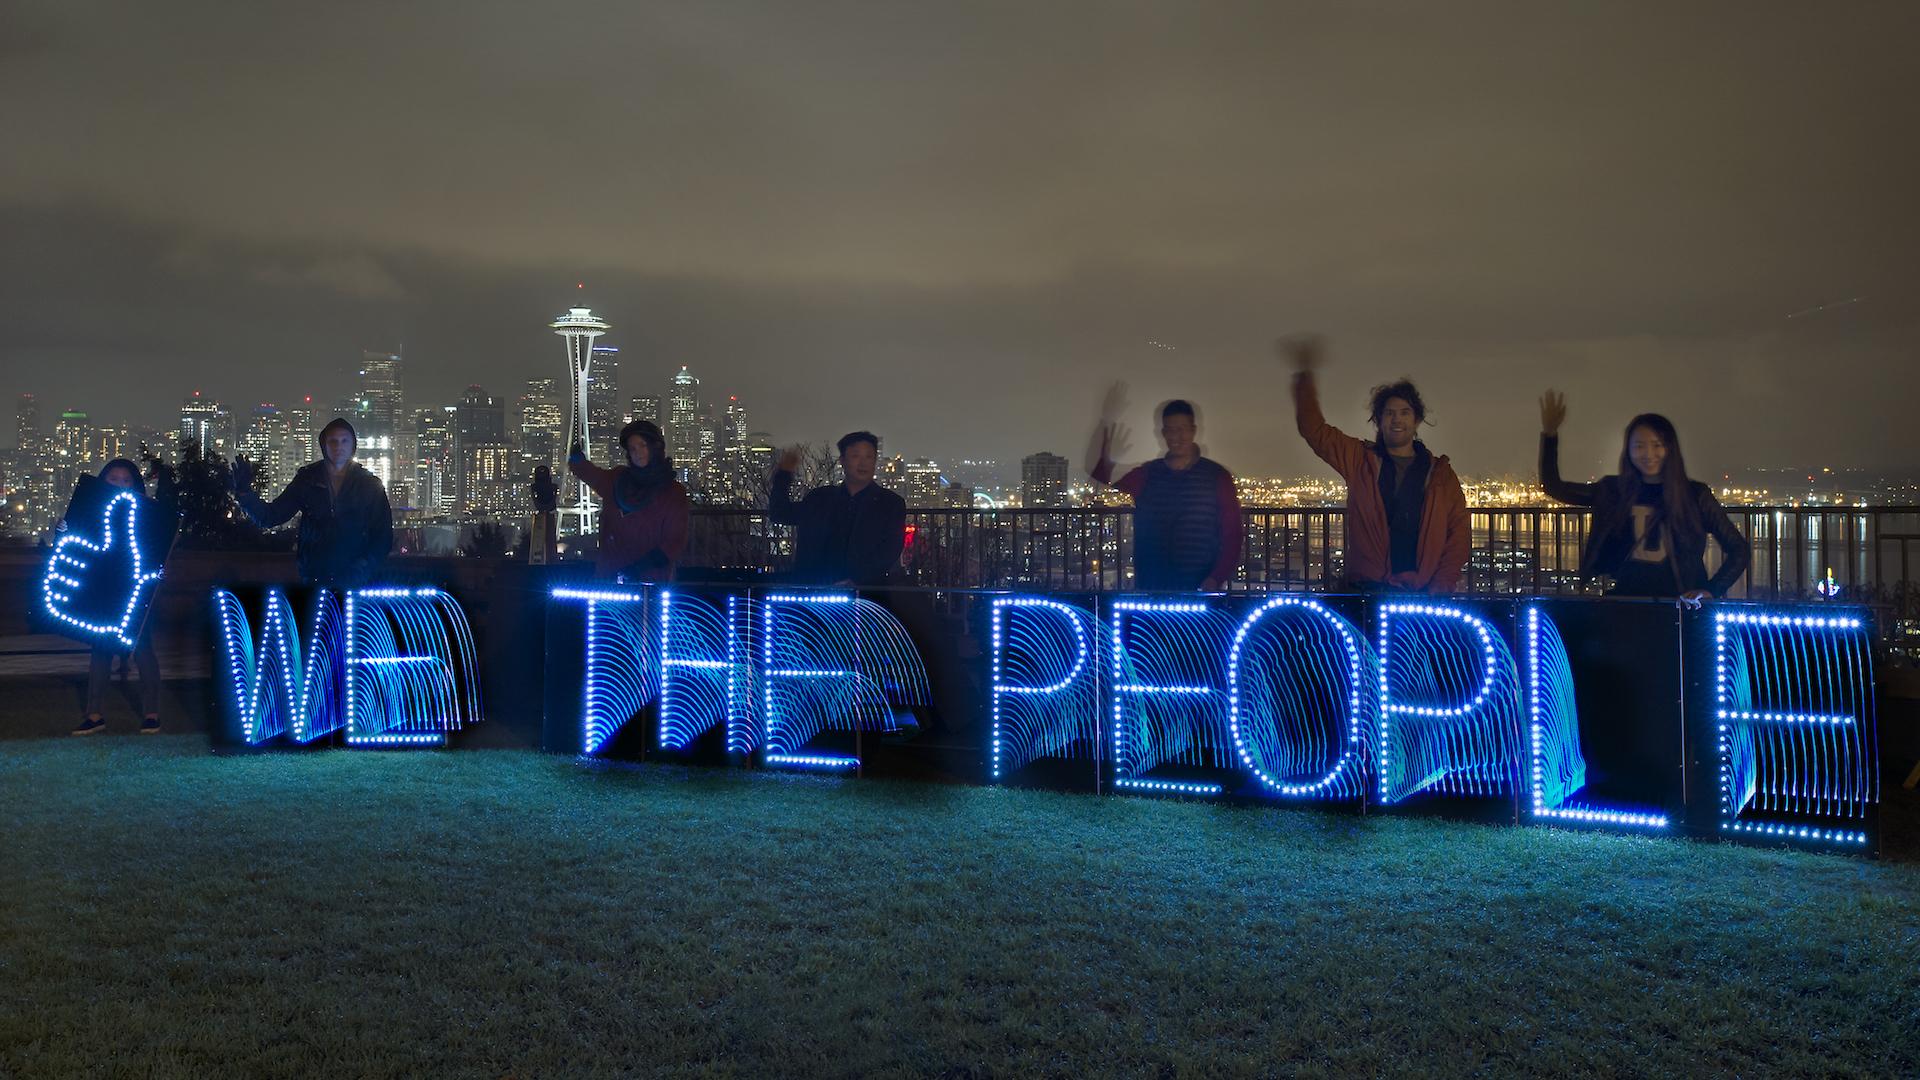 We_The_People_Light_Brigade_OLB_1920x1080px_sized_16798264759_o.jpg